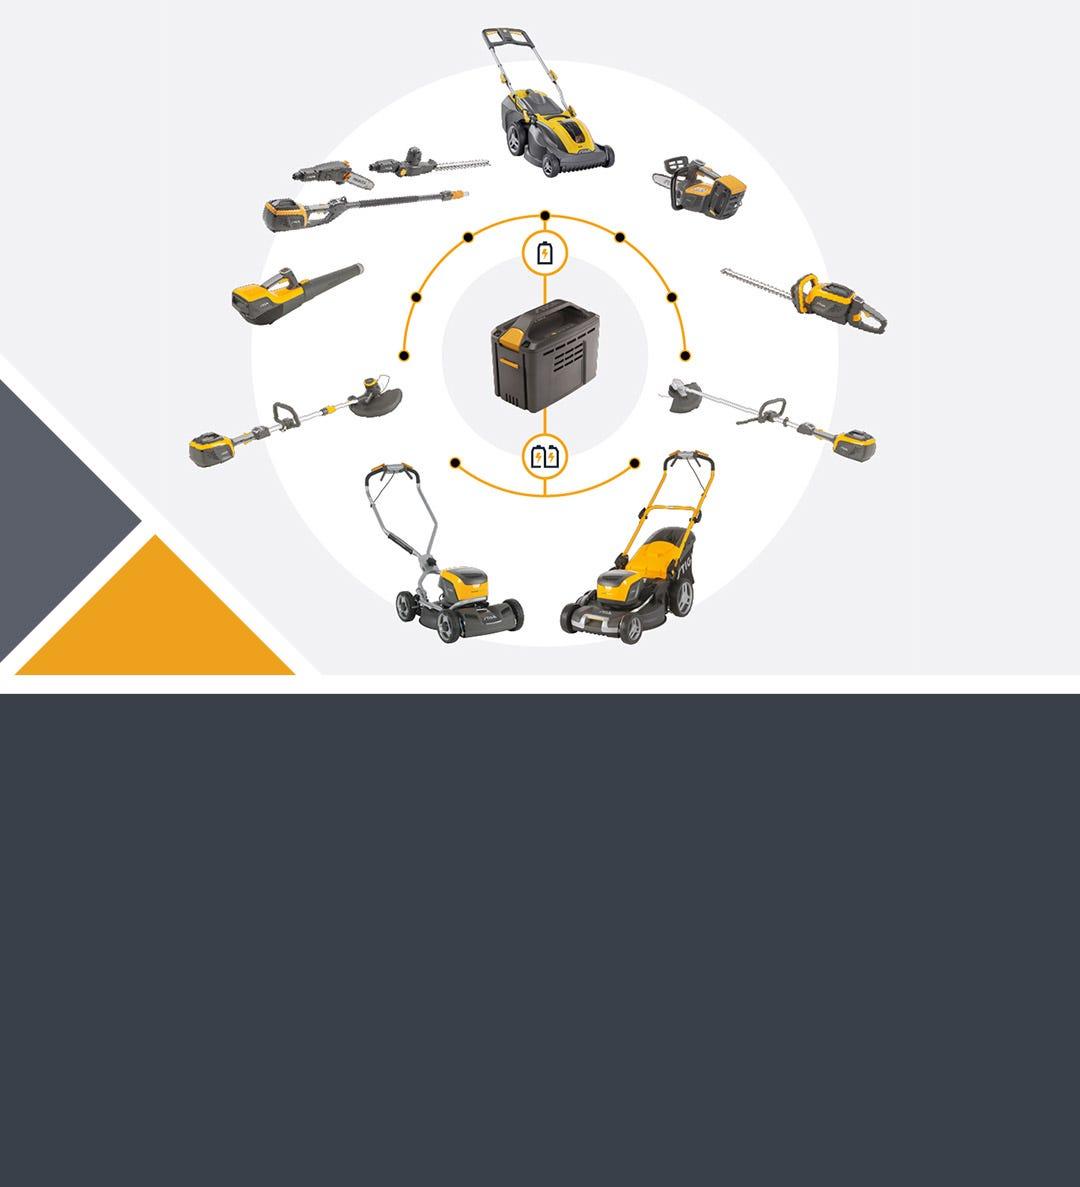 stiga-accu-tuinmachines-draadloos-batterij